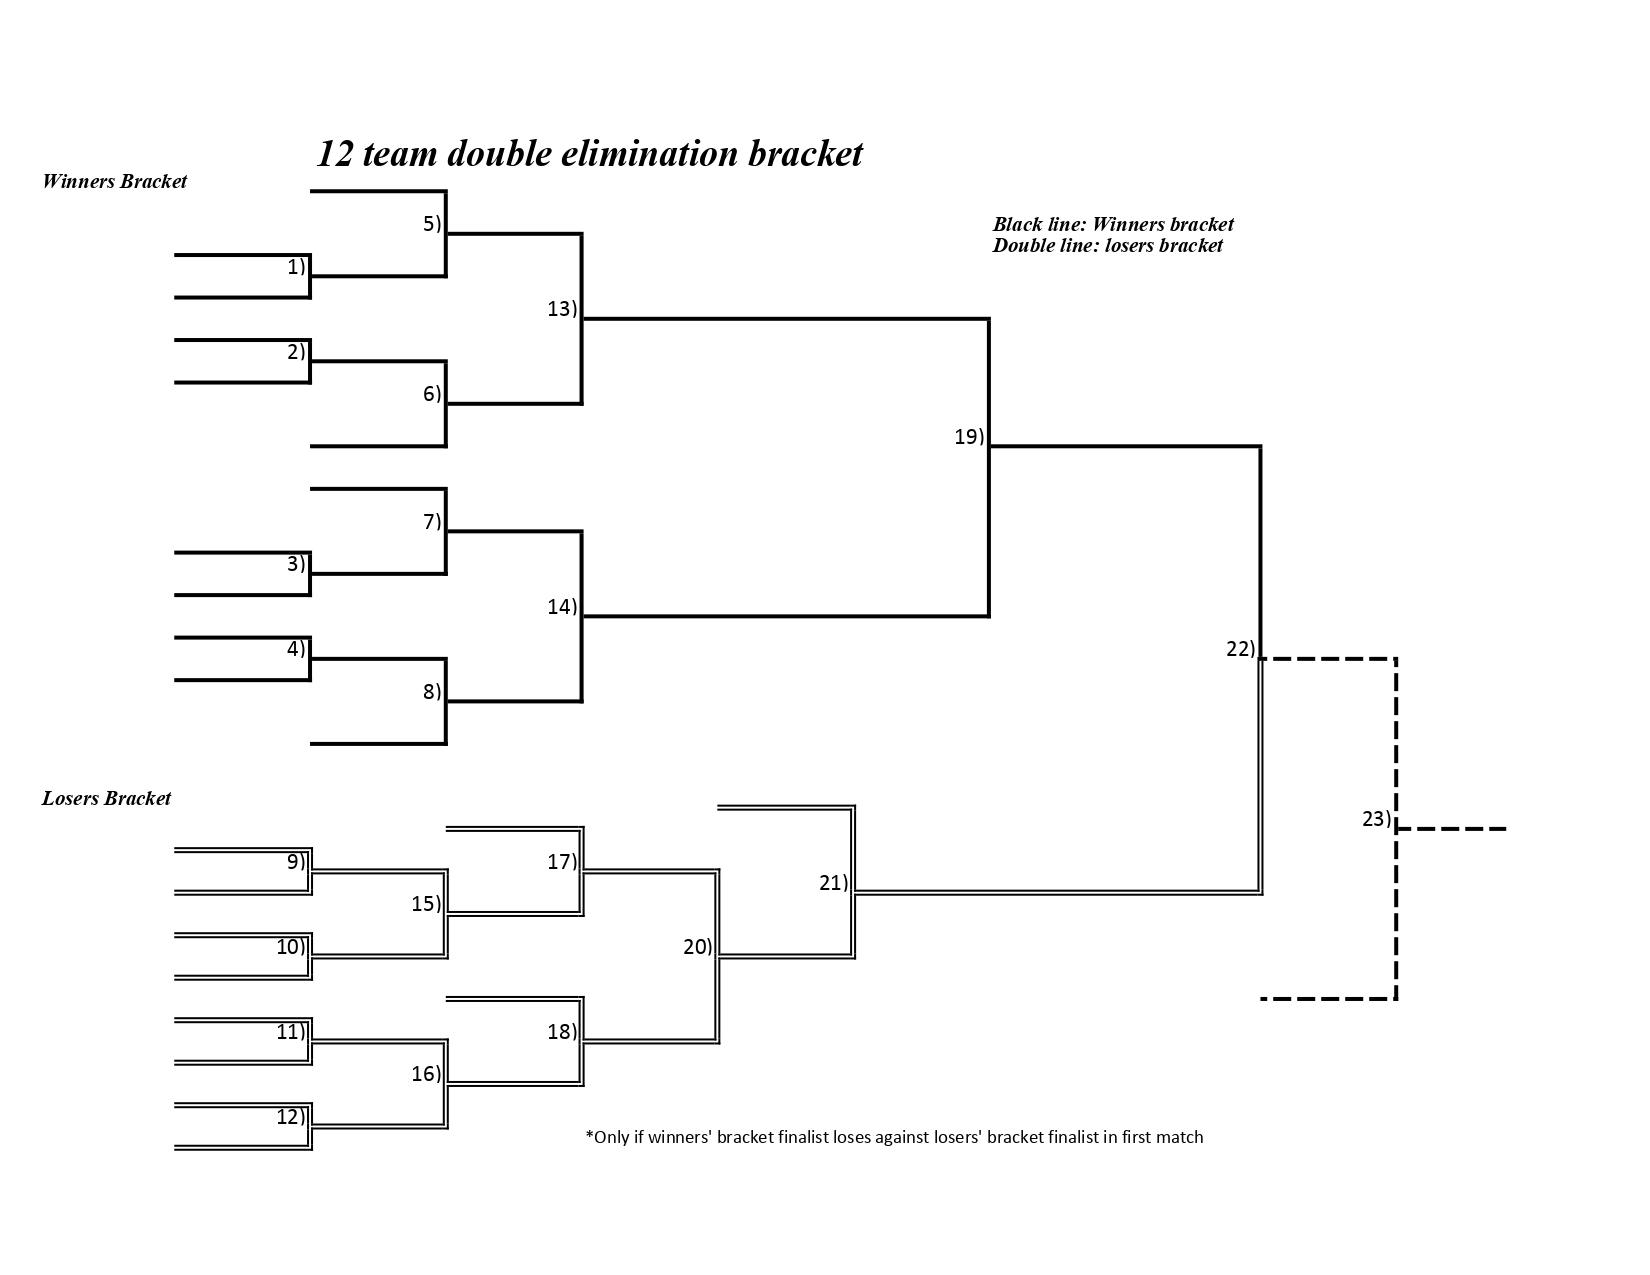 12-team double-elimination bracket